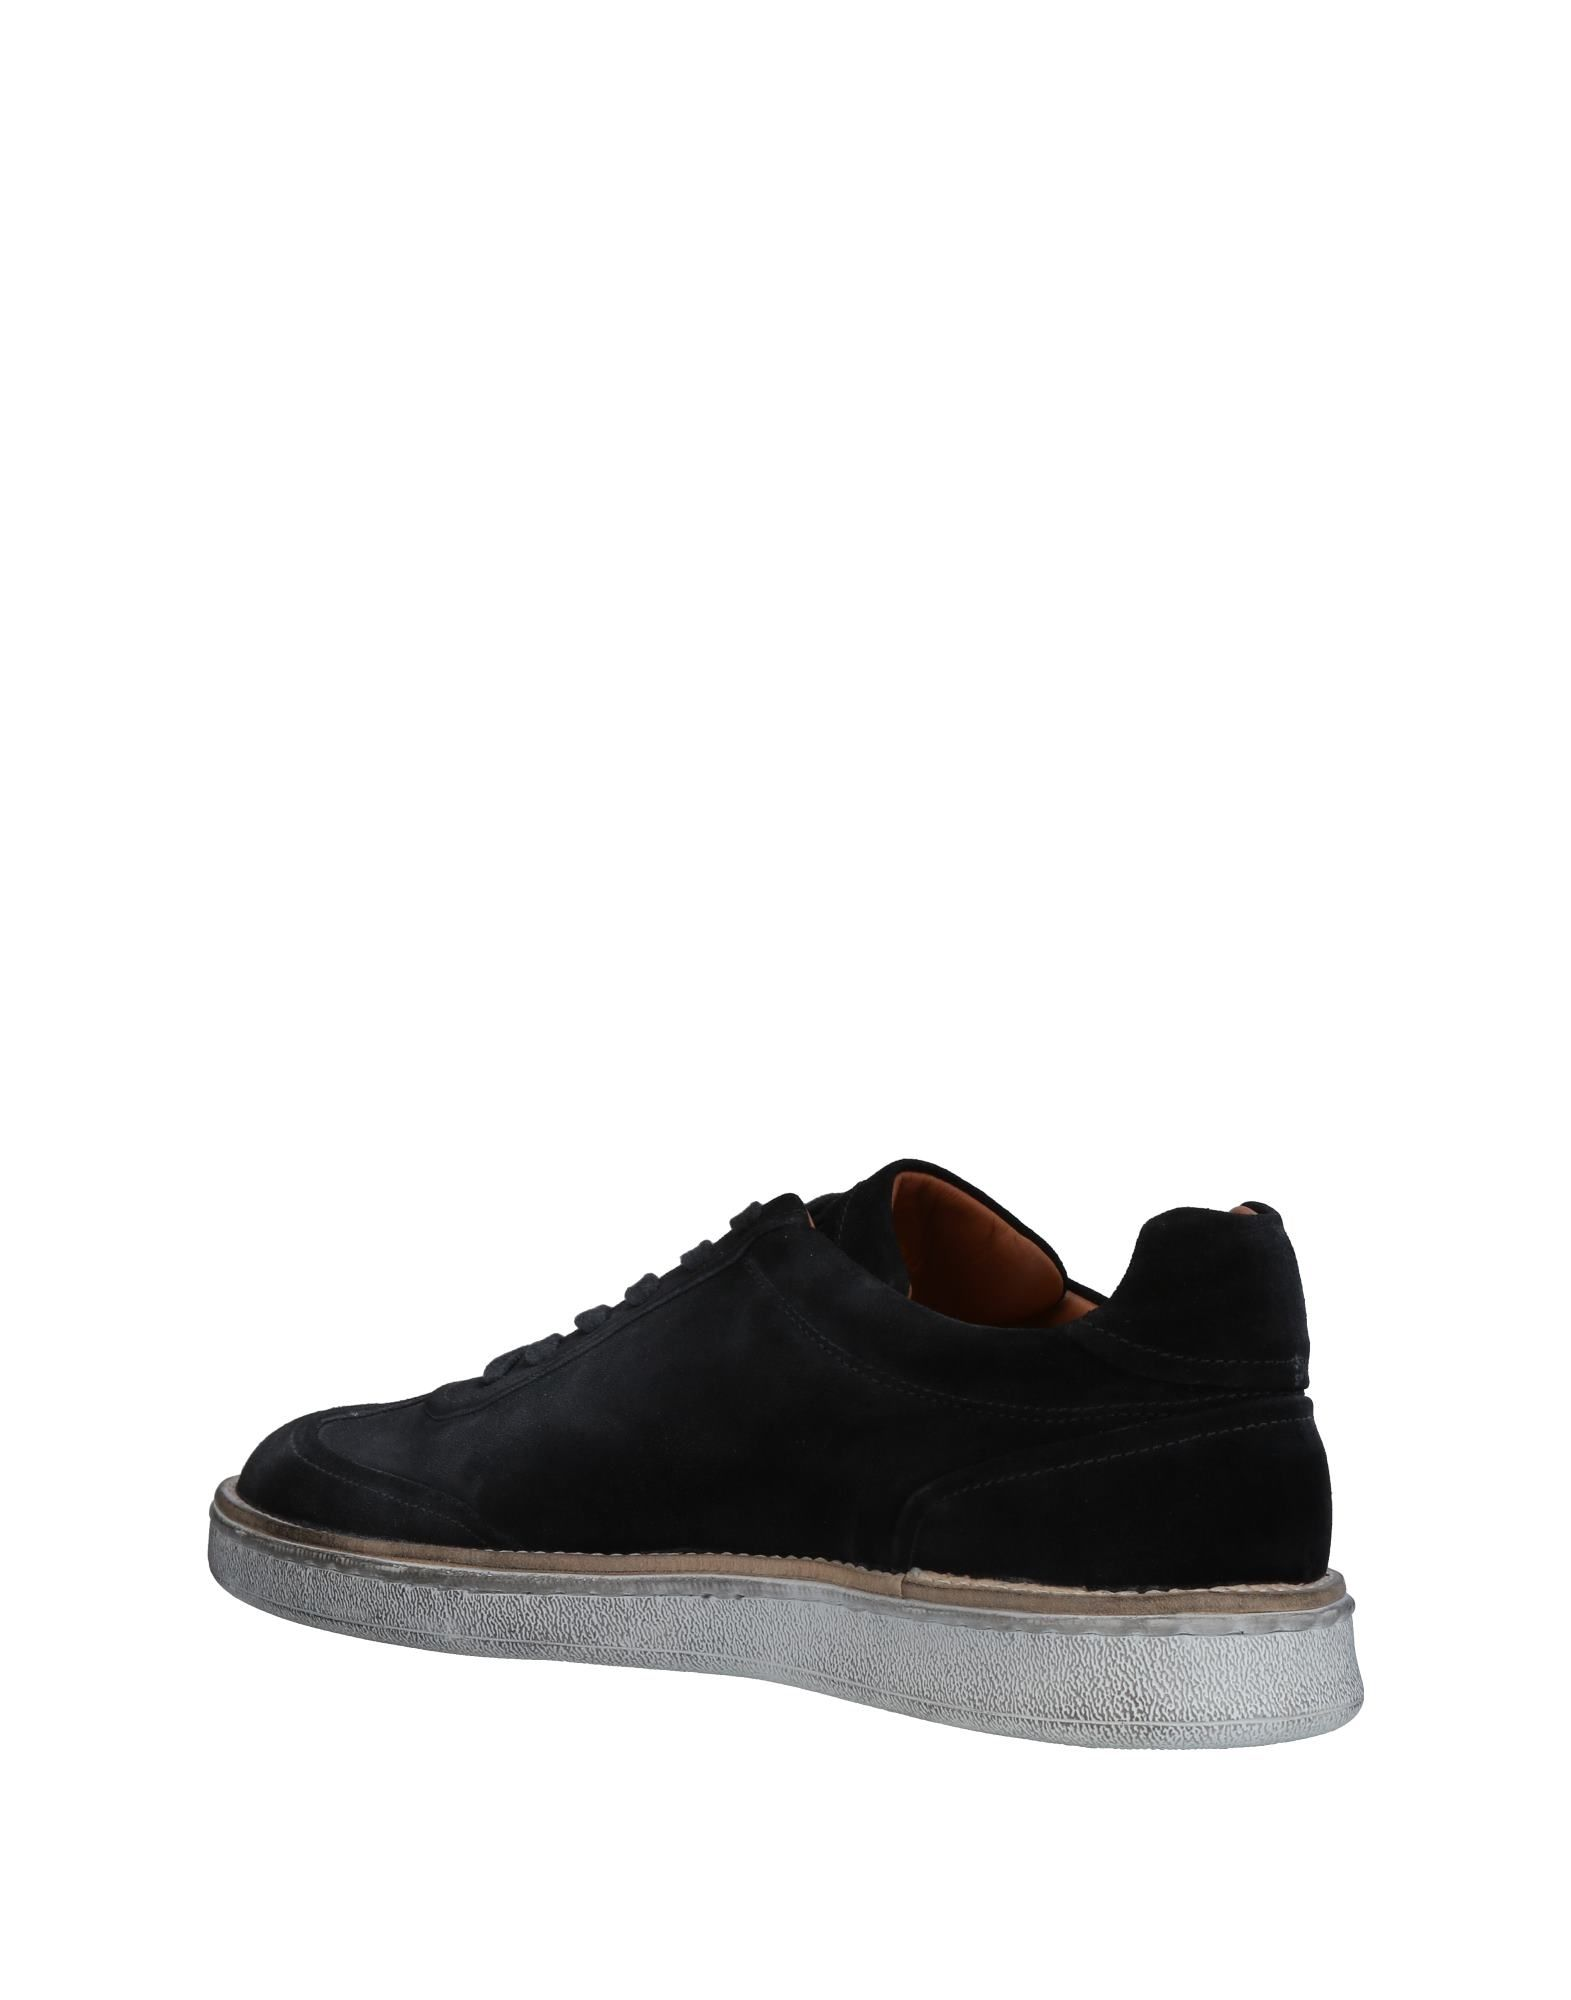 Pantofola D'oro Sneakers Herren  11455586BL Neue Schuhe